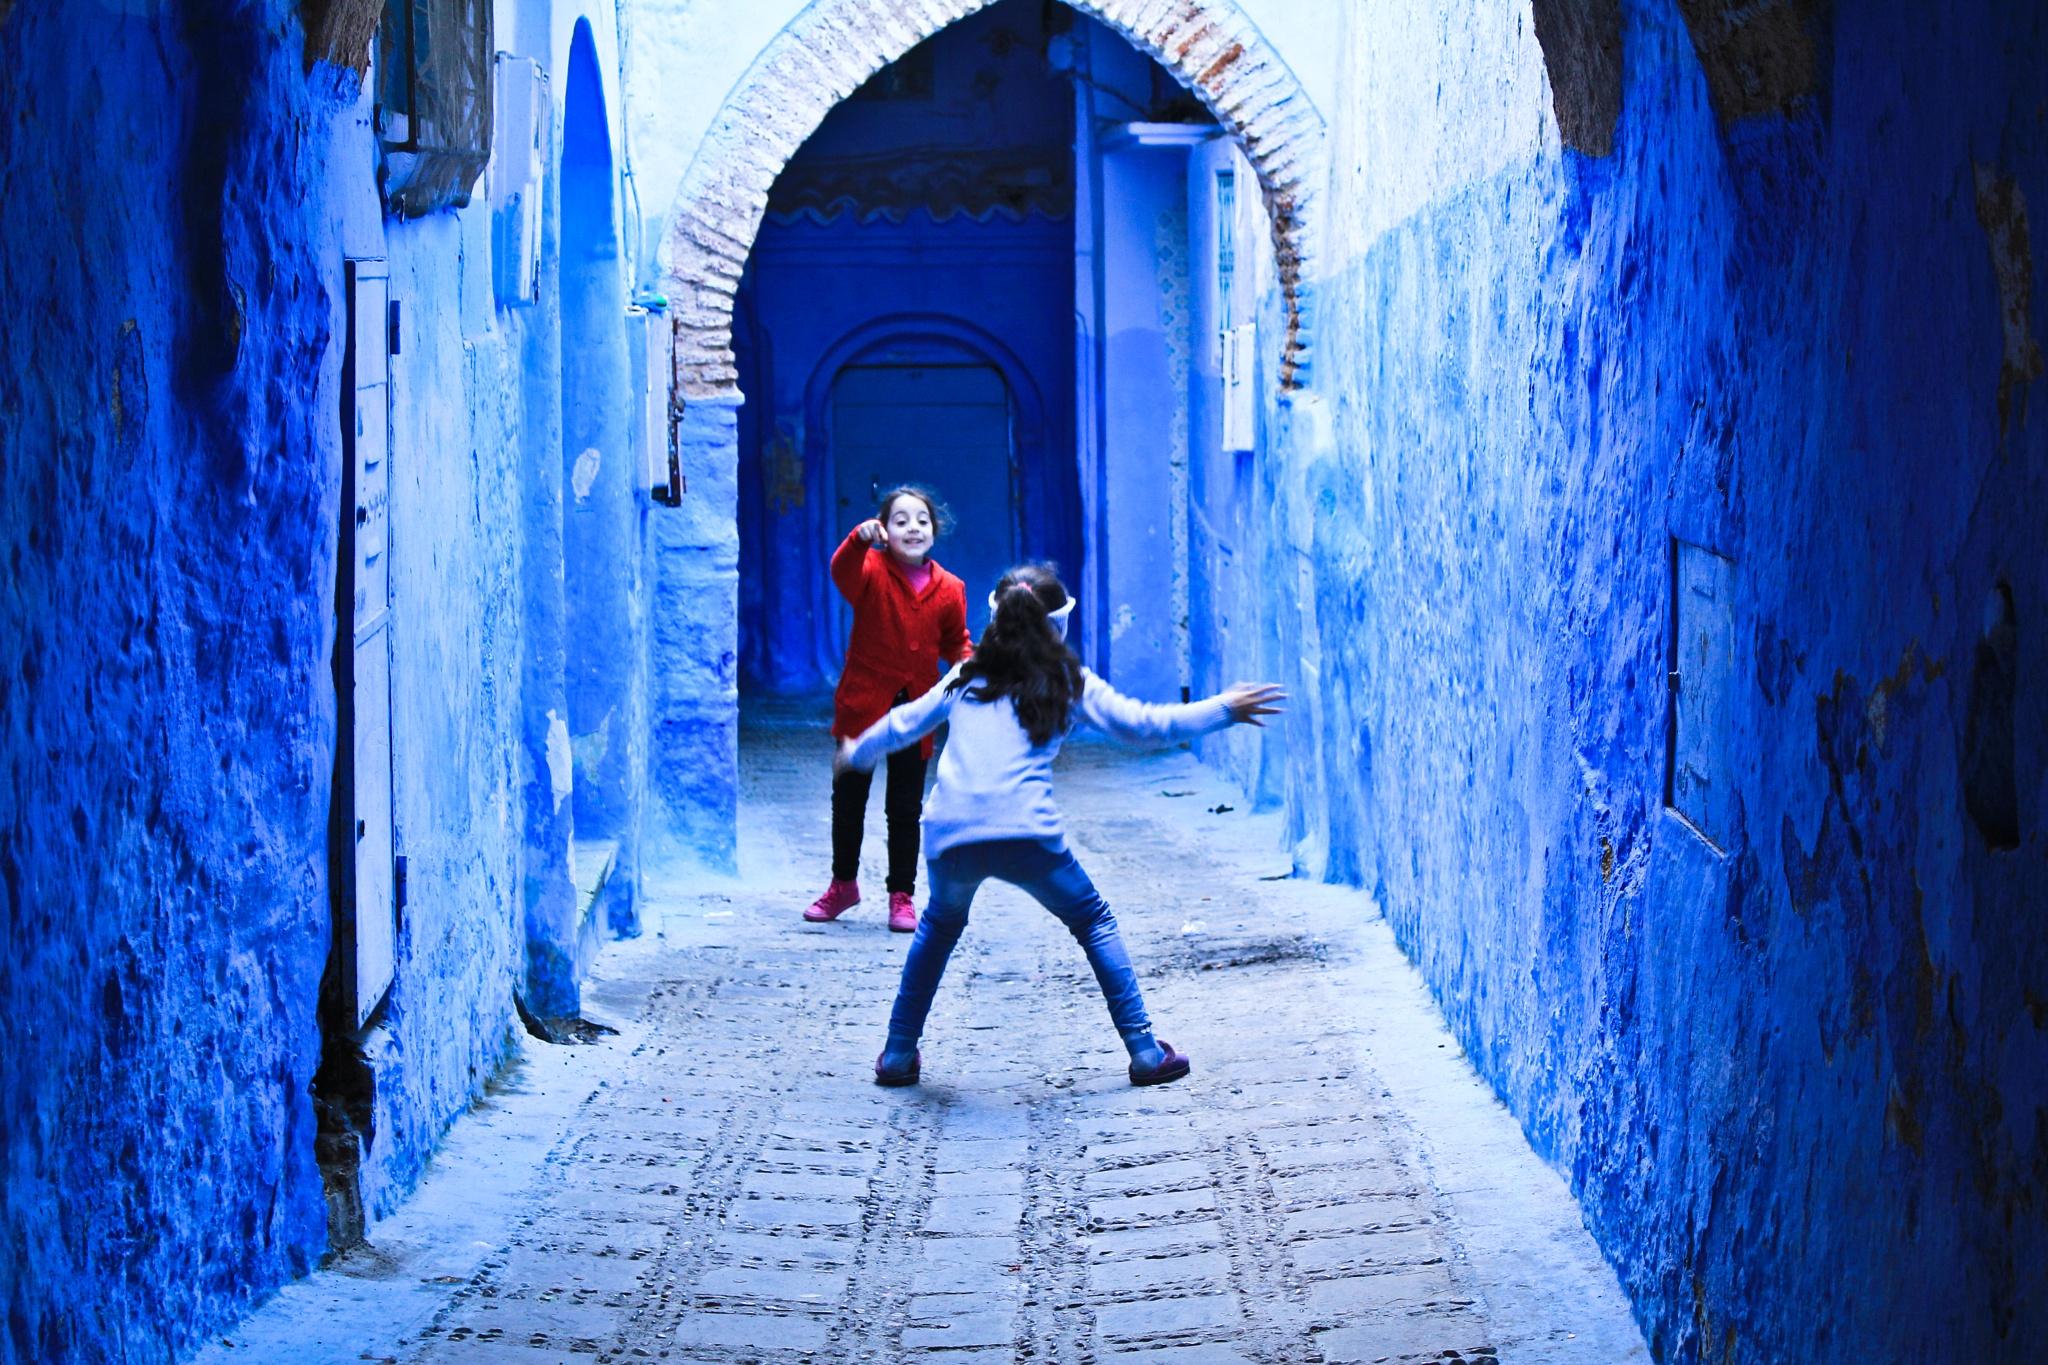 Blue Childhood by Nader Boulaich Segma